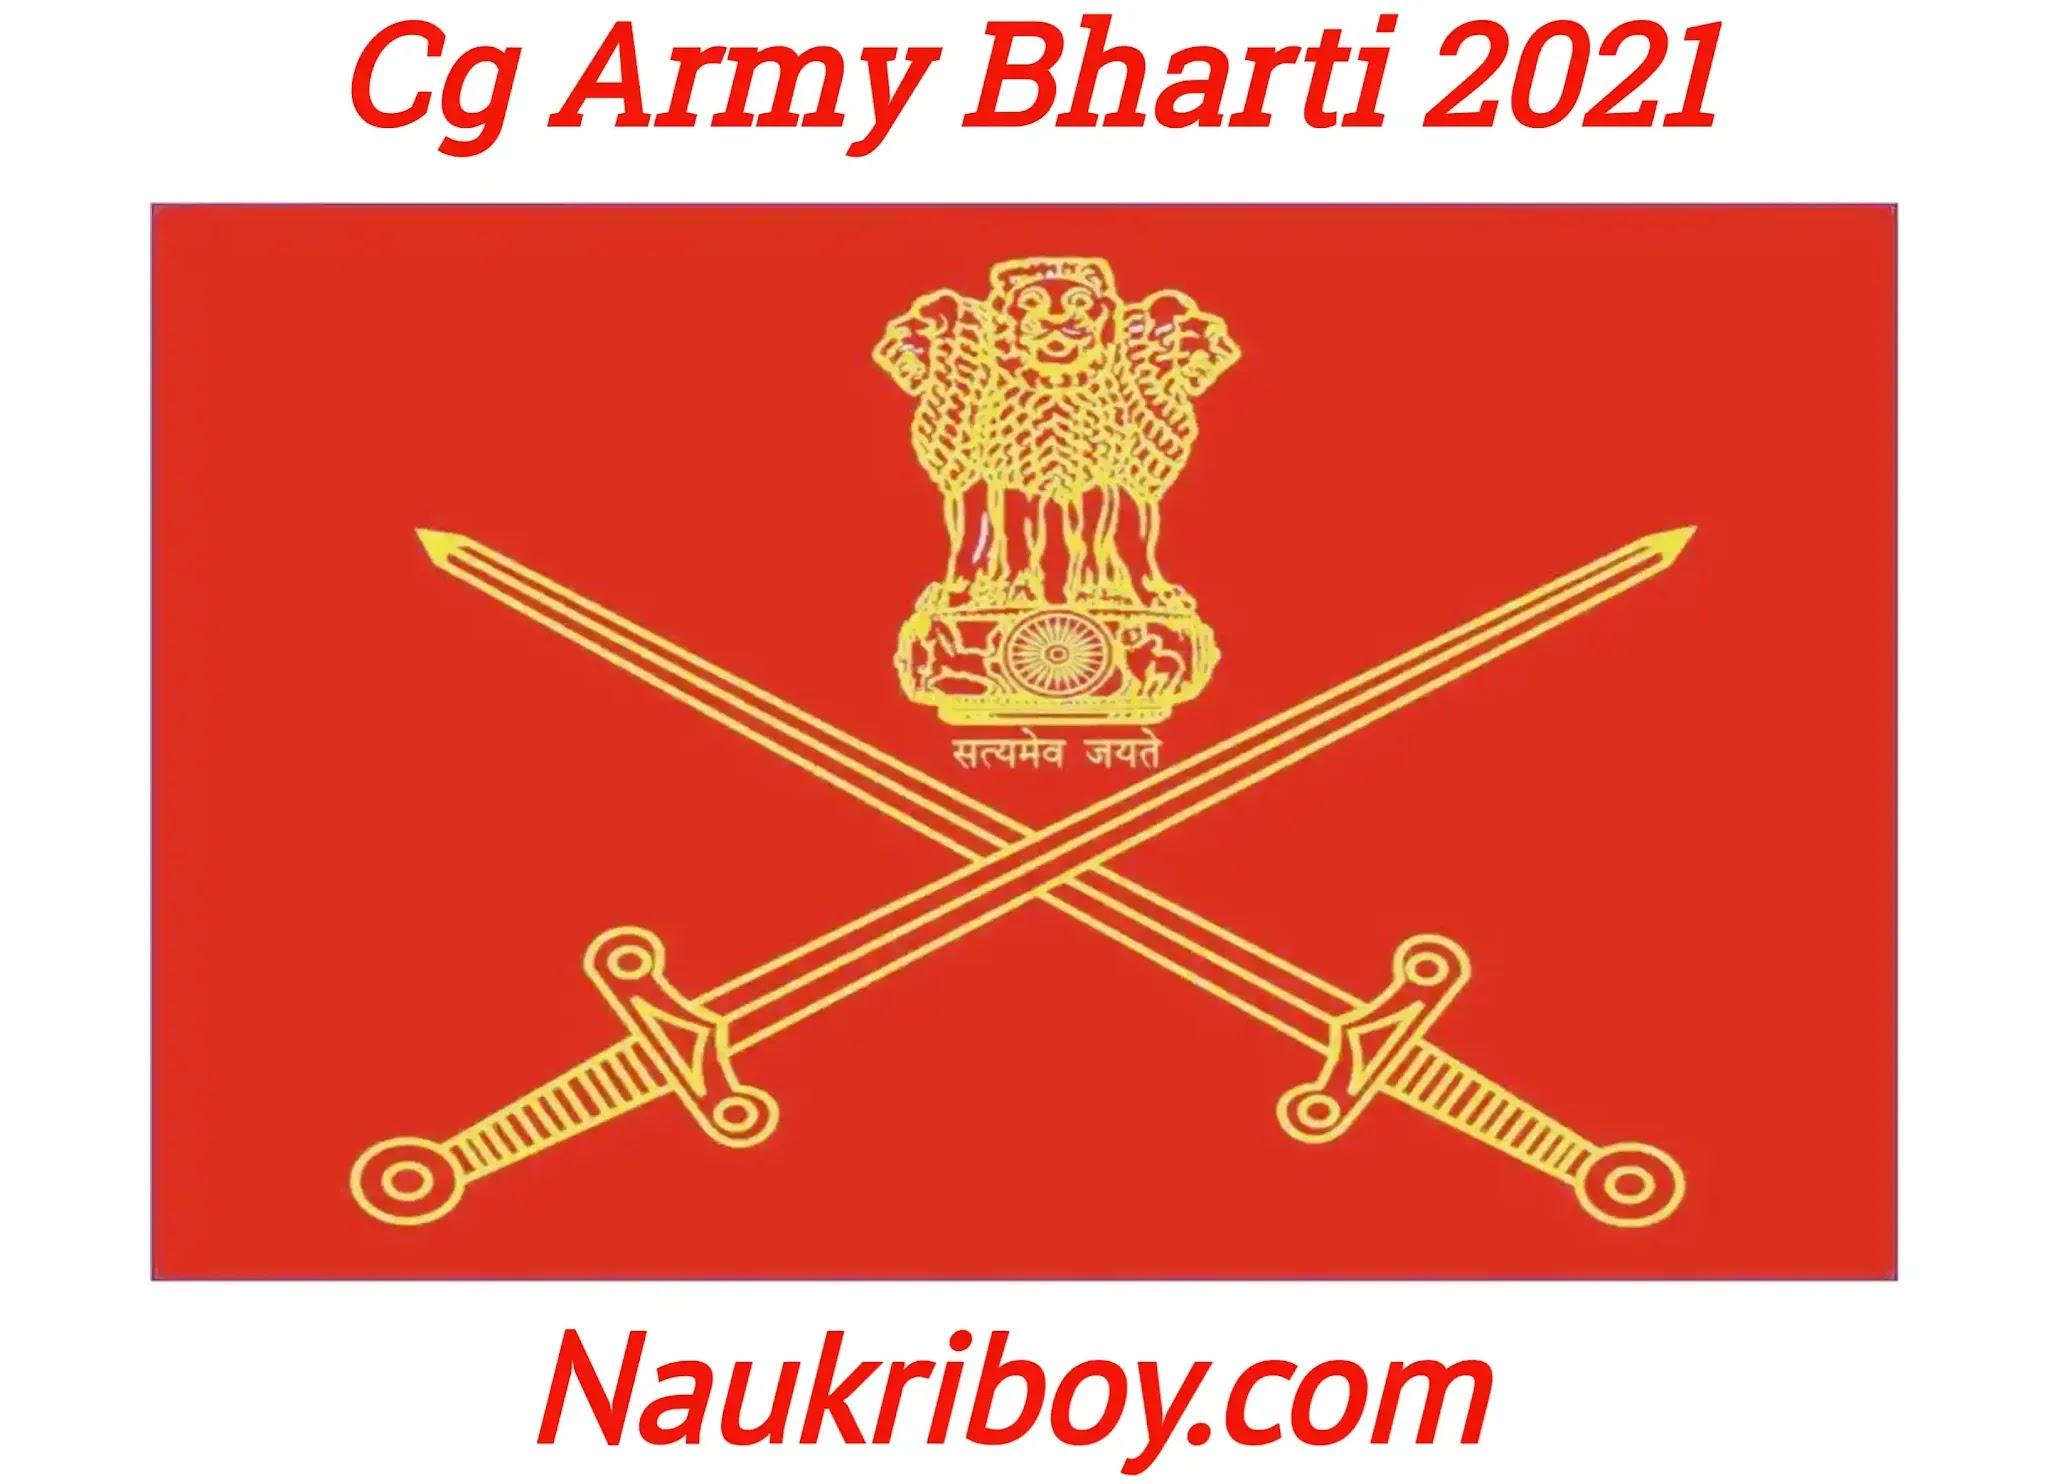 chhattisagadh army bharti 2021 letest army bharti 2021 cg army raily 2021 chhattisgarh army bharti 2021 cg army bharti 2021 cg army recruitment letest army recruitment chhattisgarh army recruitment 2021 naukriboy.com naukriboy army bharti naukriboy.com army recruitment छत्तीसगढ़ आर्मी भर्ती 2021 छत्तीसगढ़ आर्मी रैली 2021